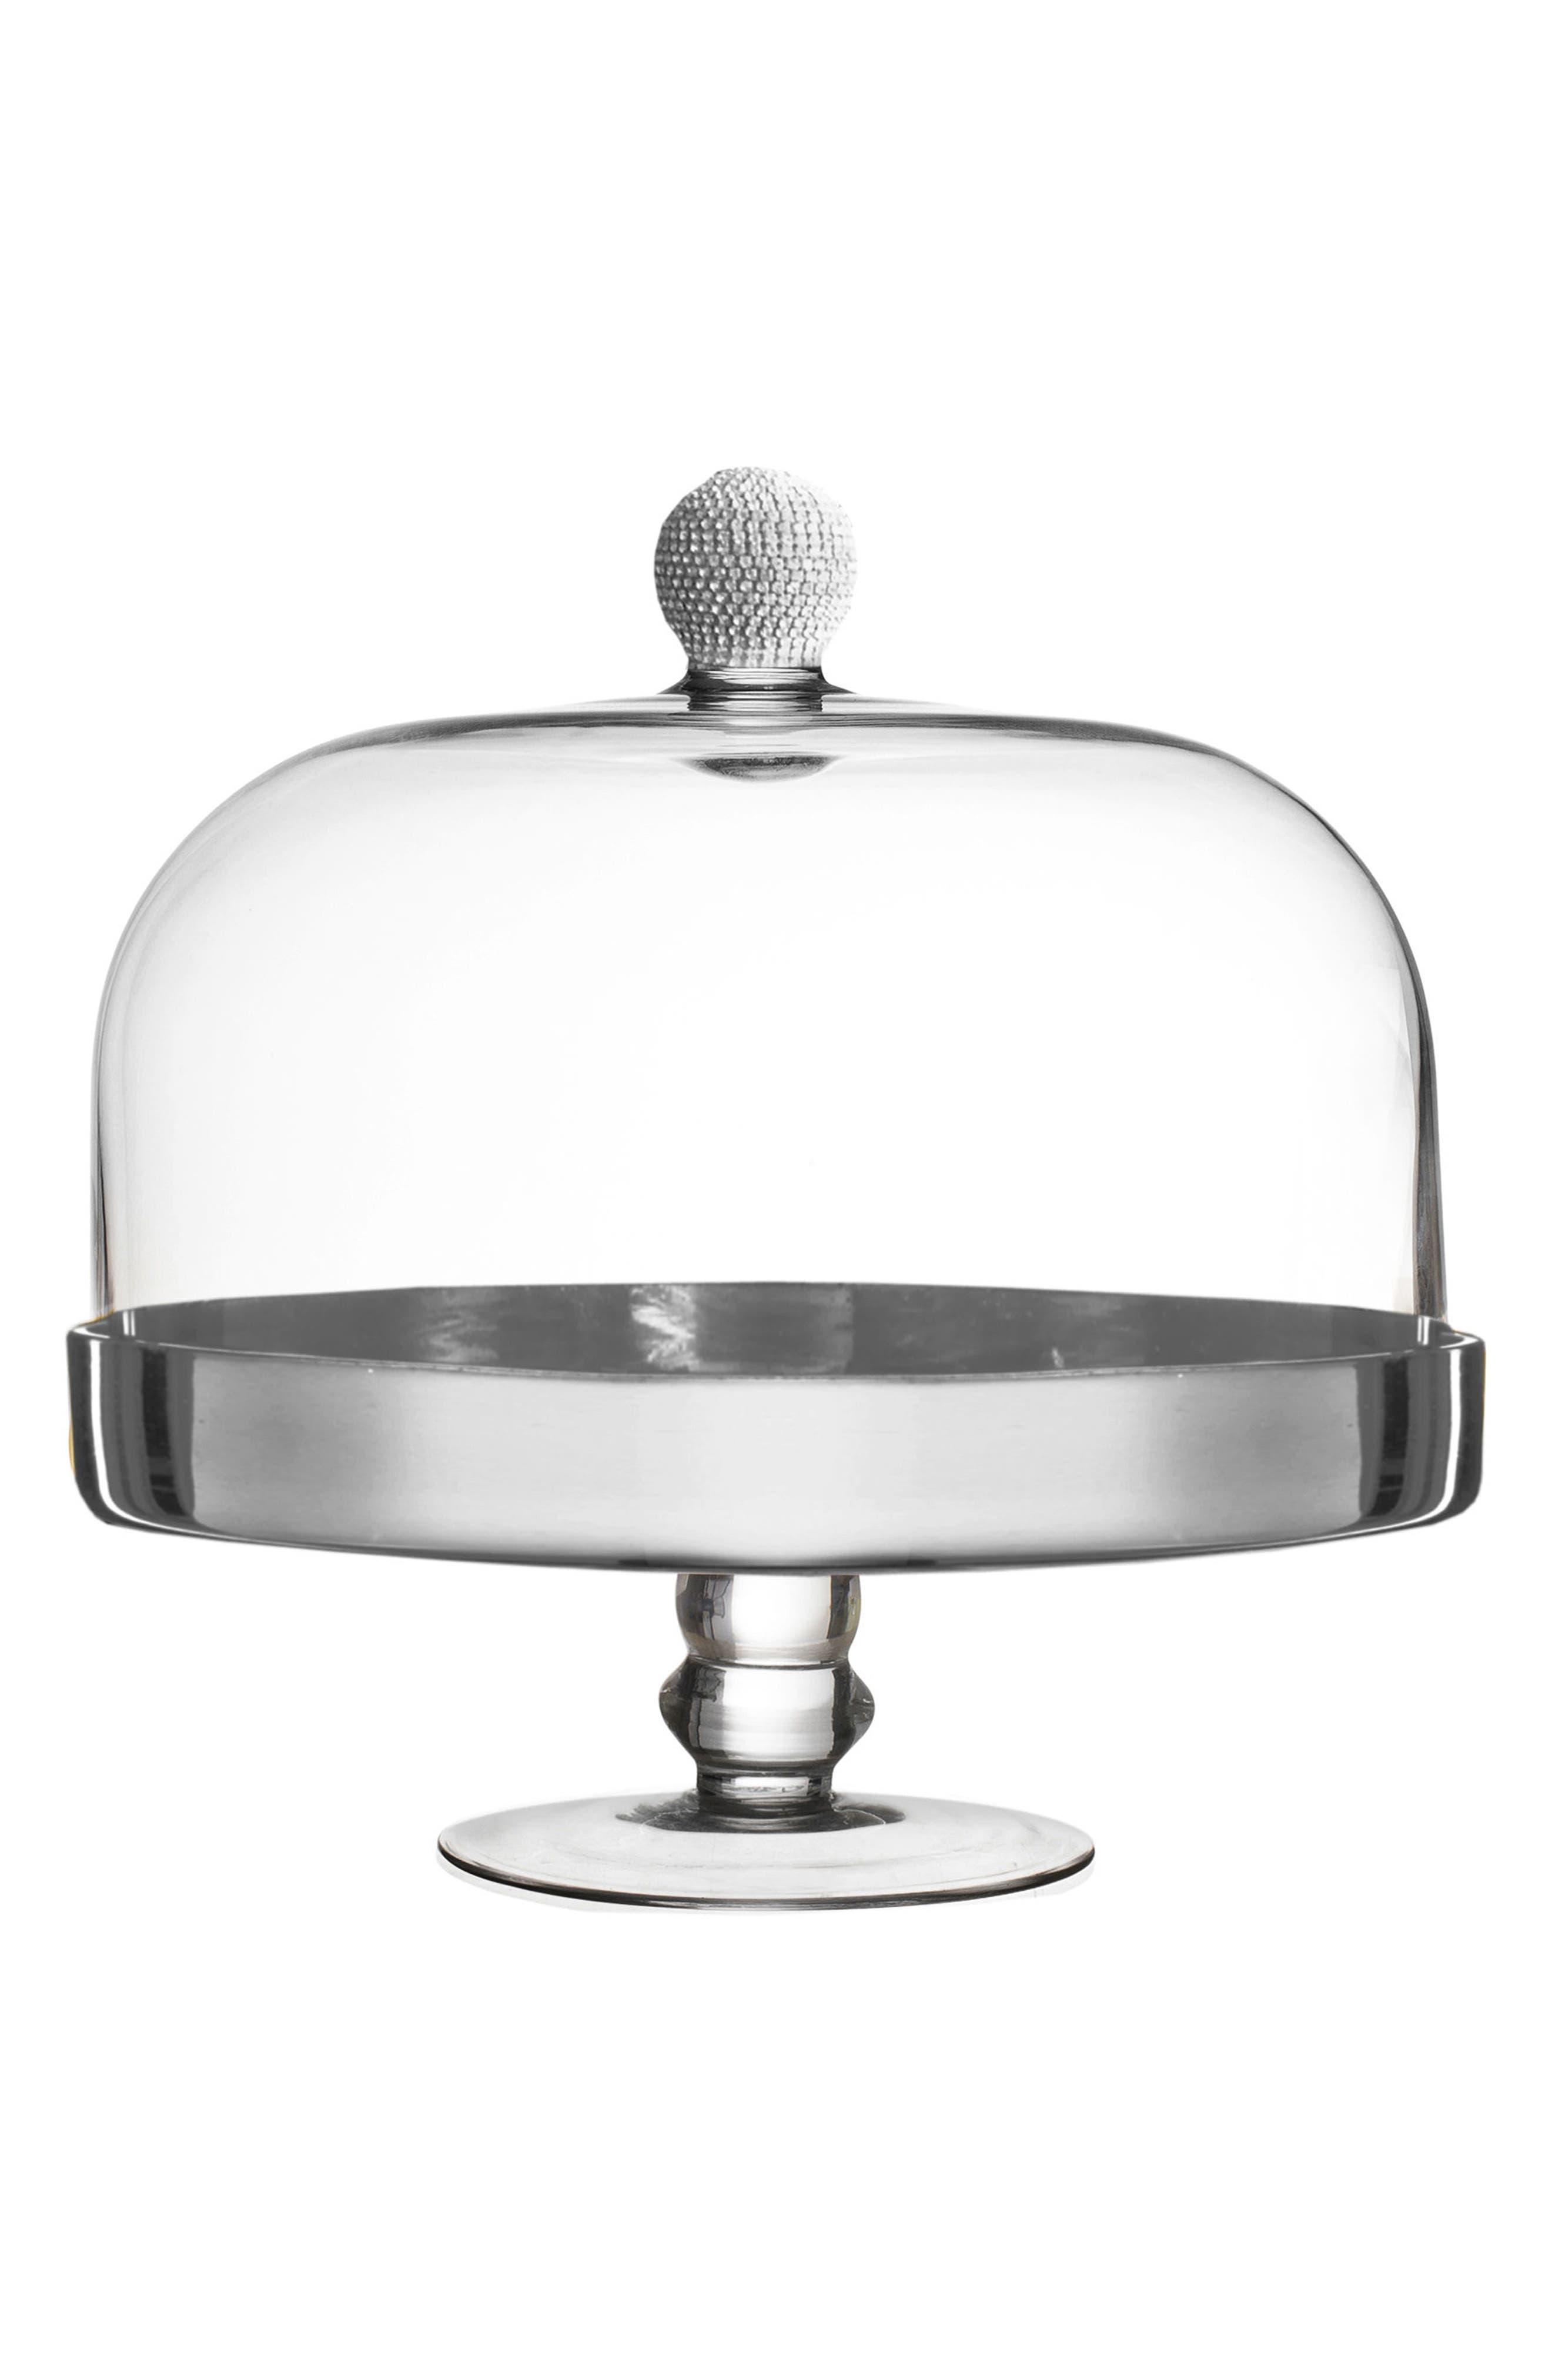 Silver Medley Pedestal Plate,                             Main thumbnail 1, color,                             040